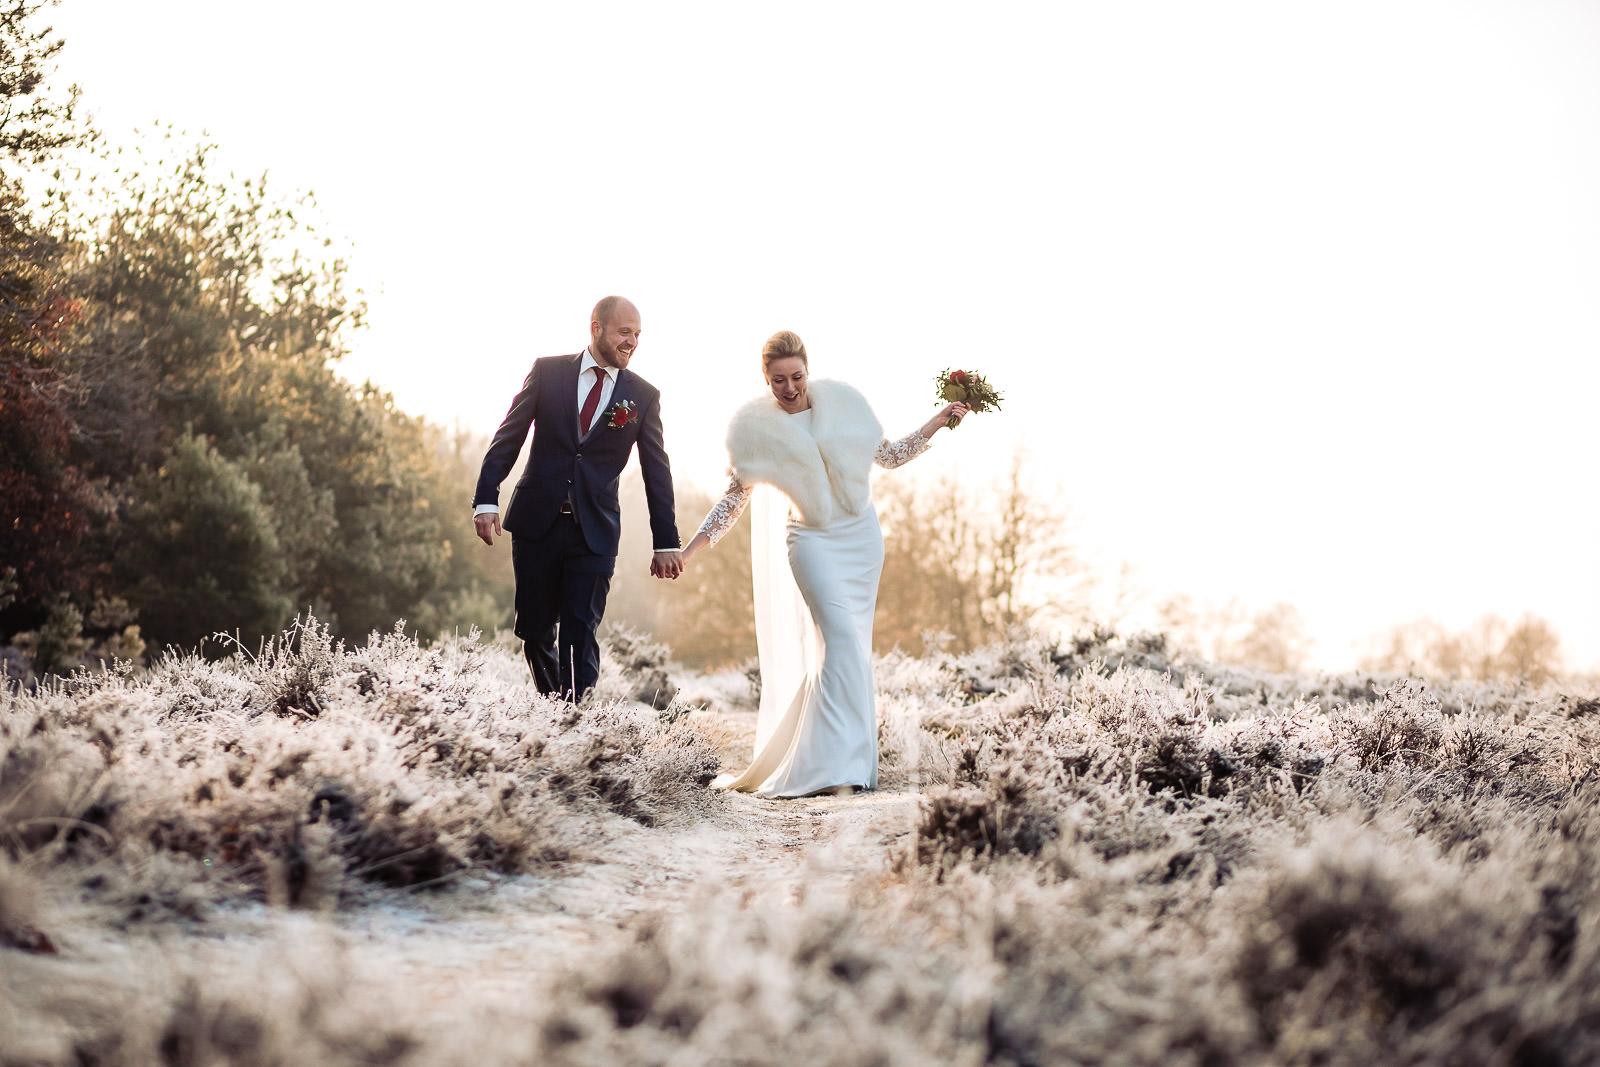 Bruidsfotograaf | Winterbruiloft | Sofie & Simon